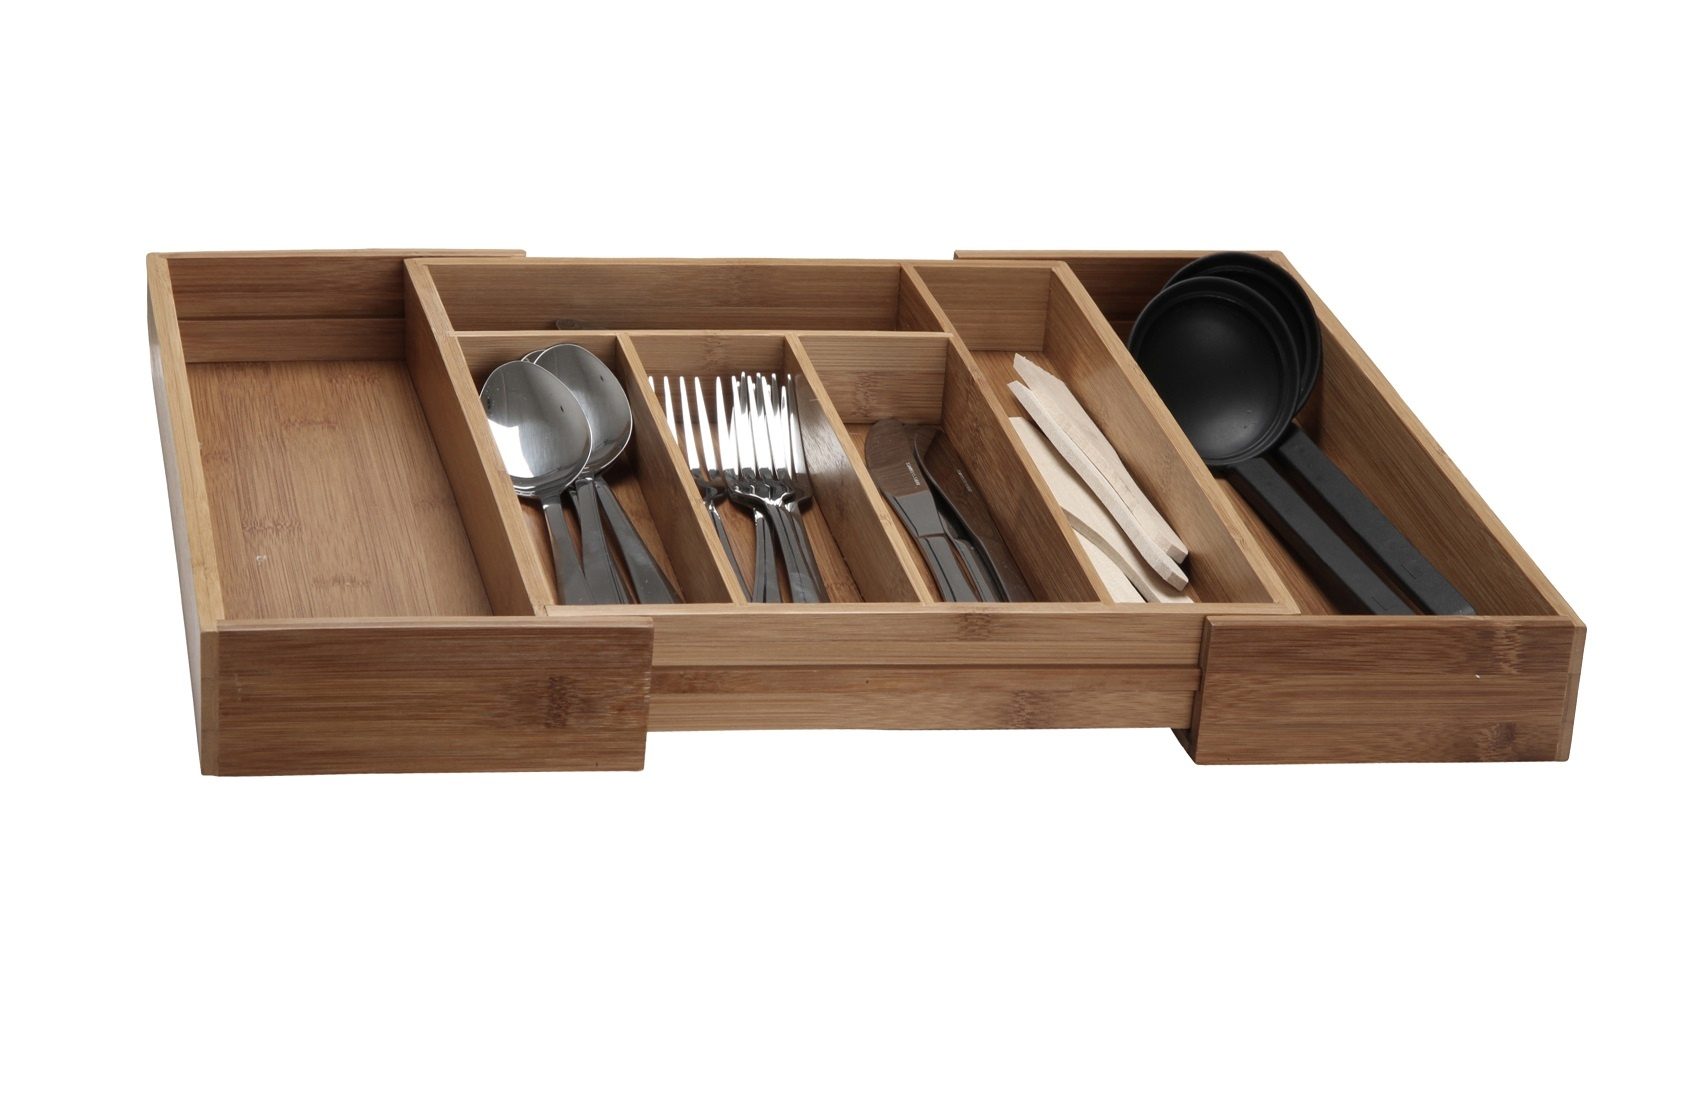 Extendable Bamboo Cutlery Box Wood Kitchen Drawer Organiser Utensil Storage Tray Ebay